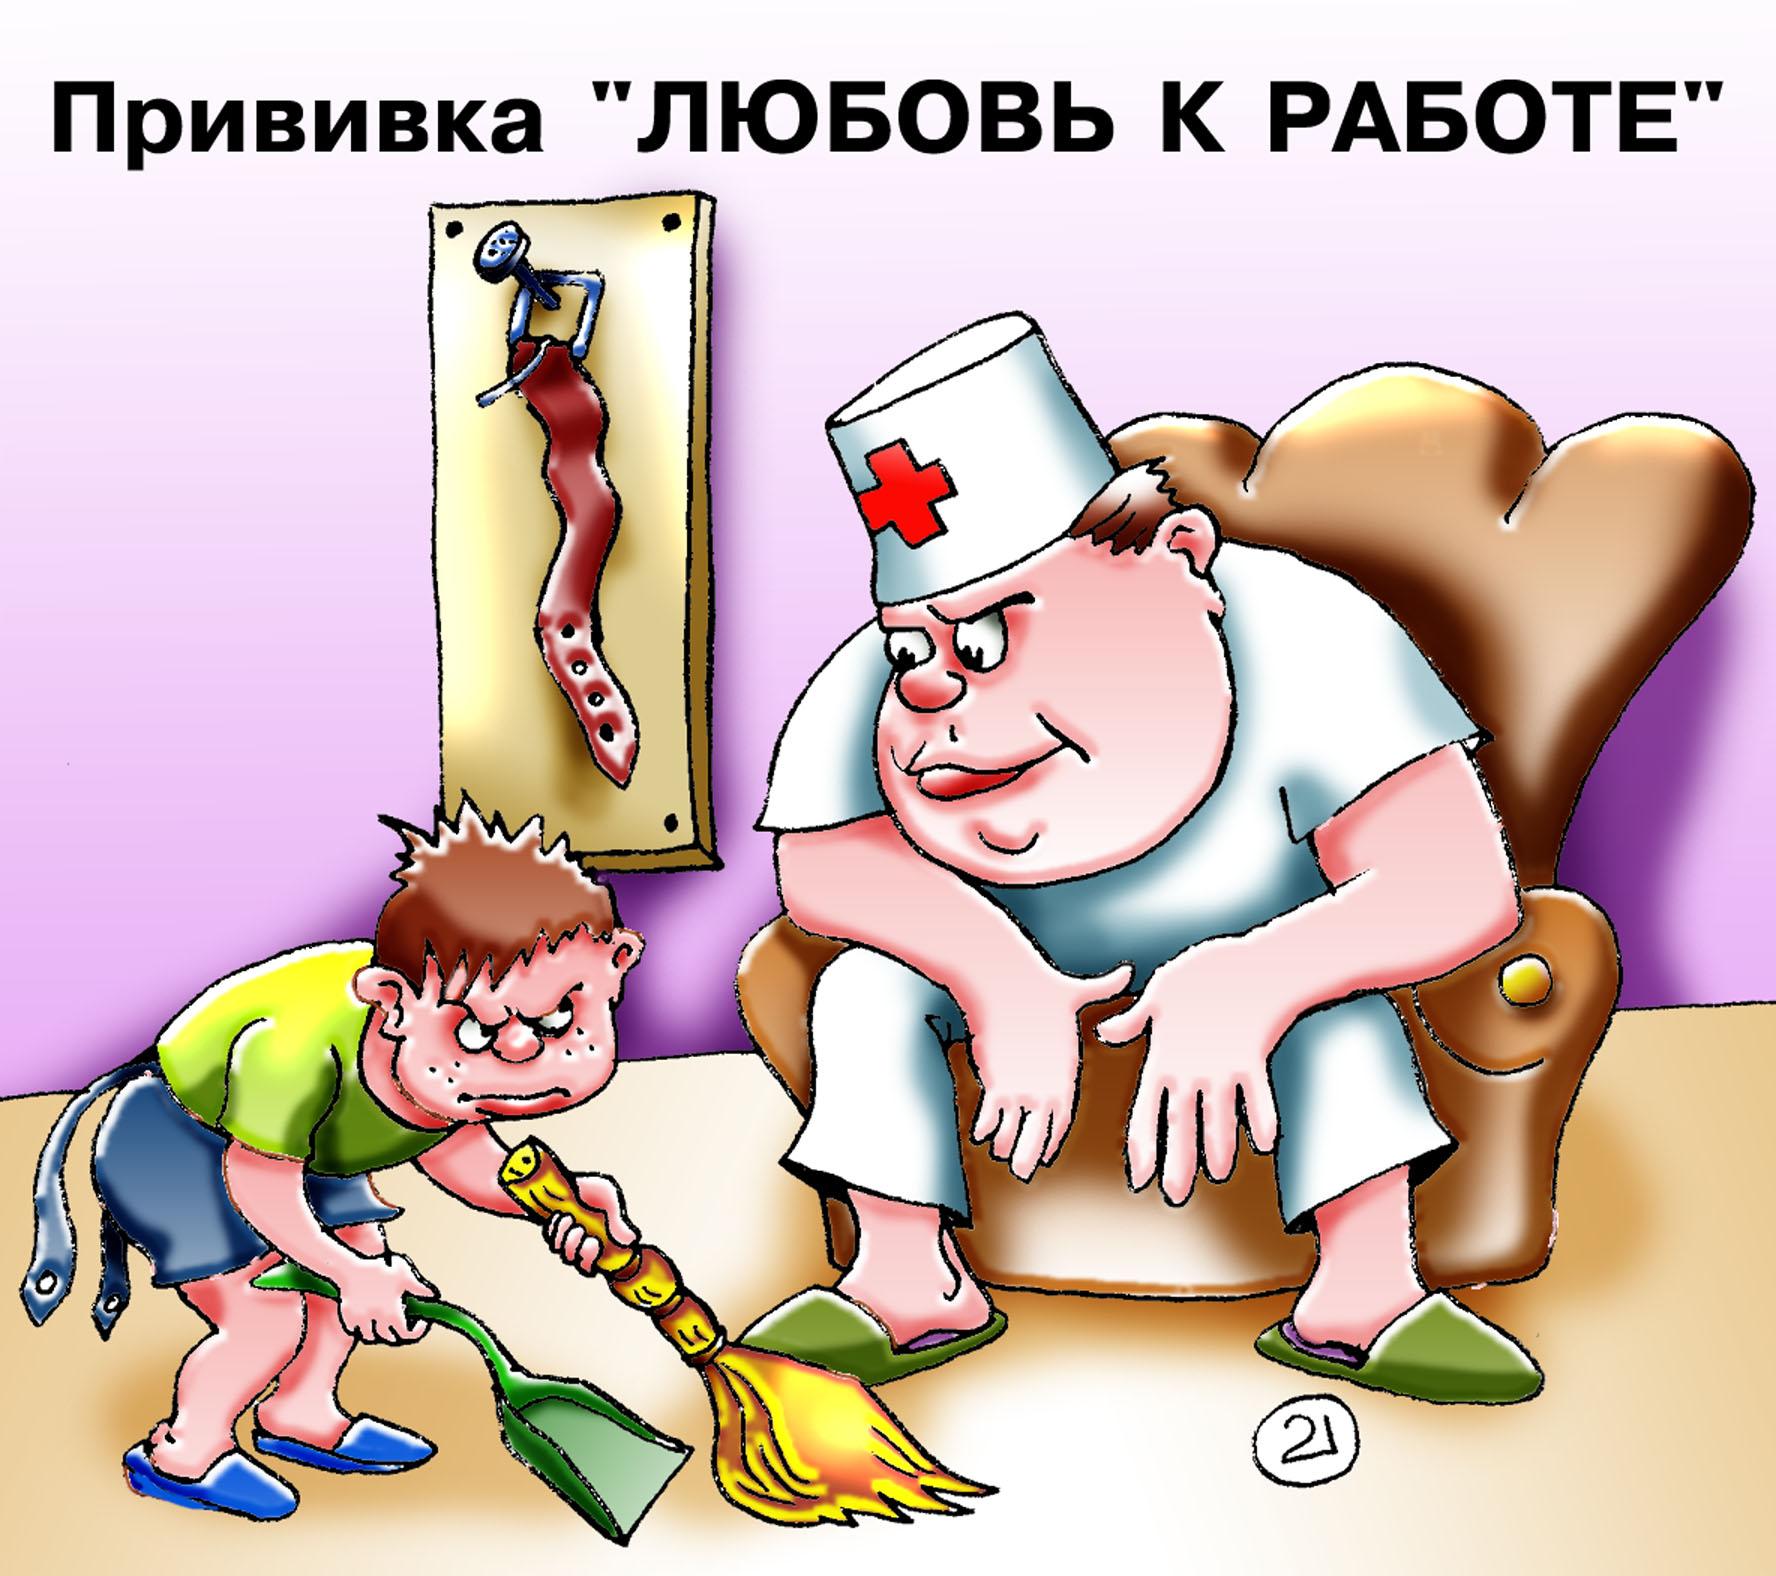 Наказание картинка прикол